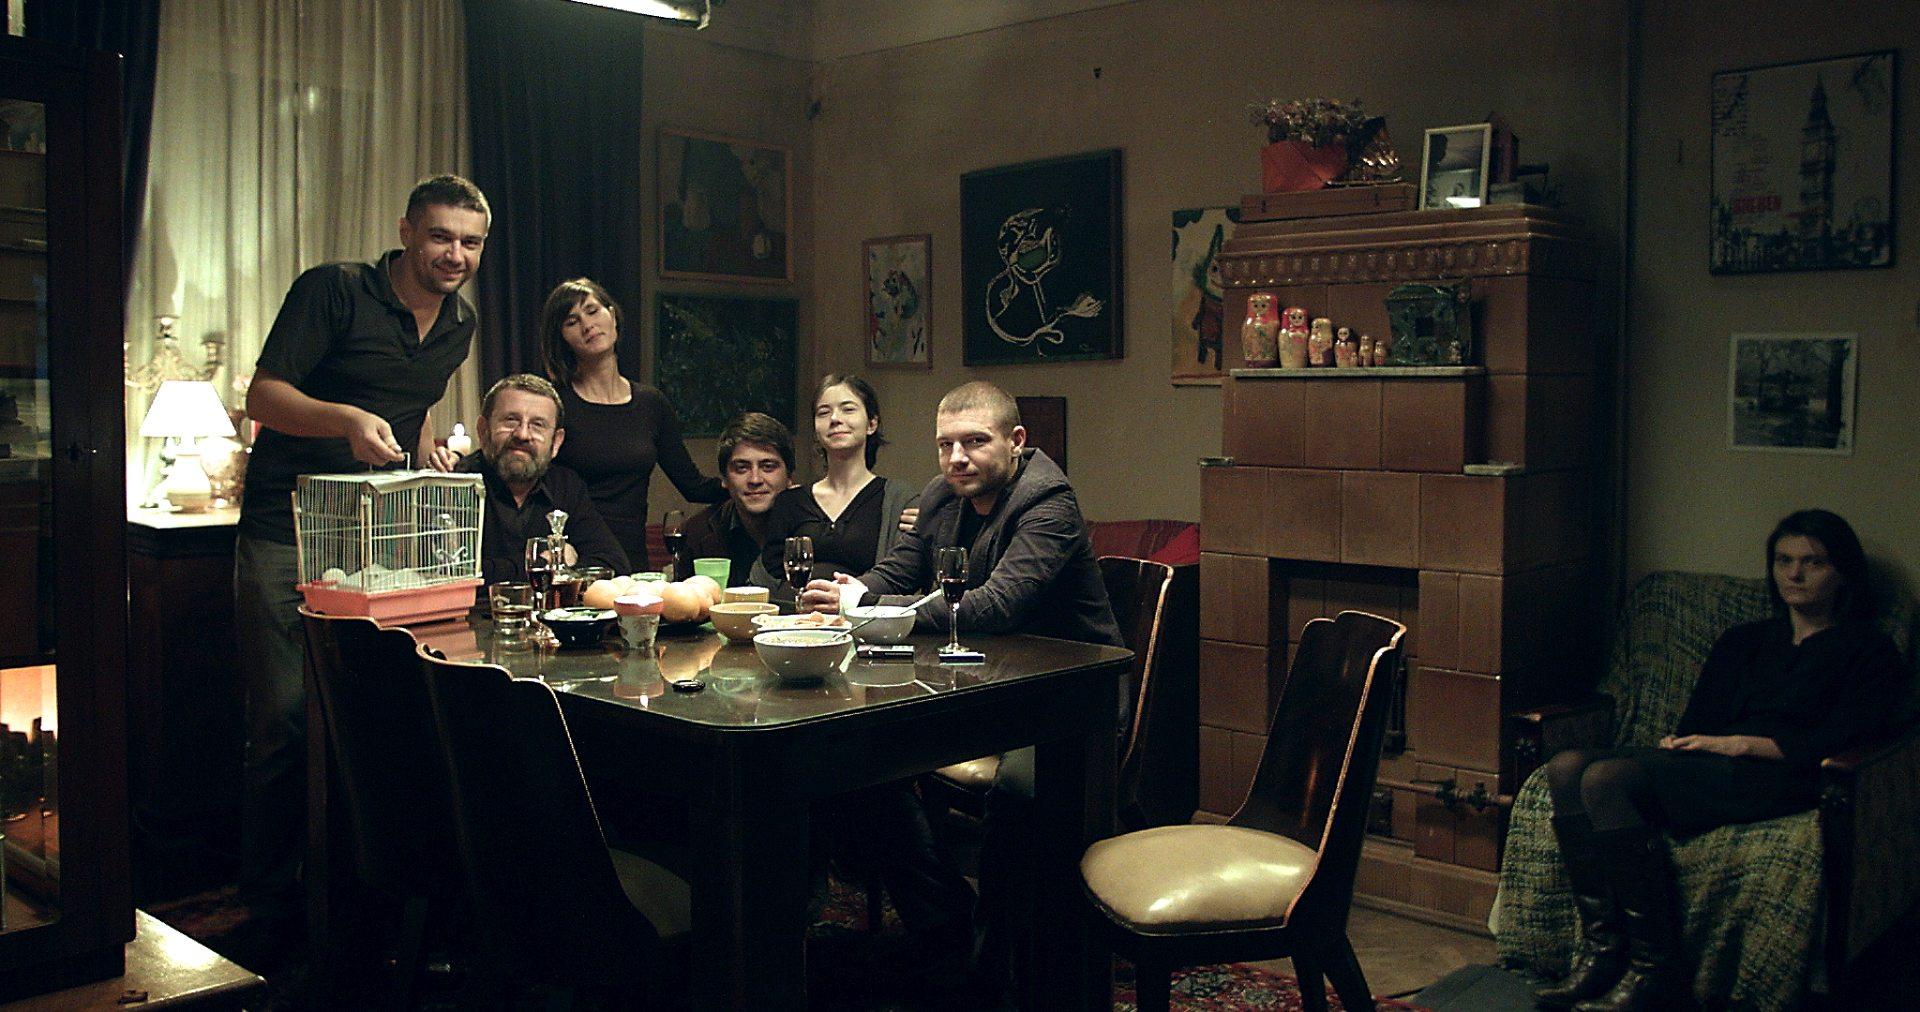 """Ilegitim"" merge la FESTIVALURI Kazahstan, Olanda, Belgia și țările nordice"